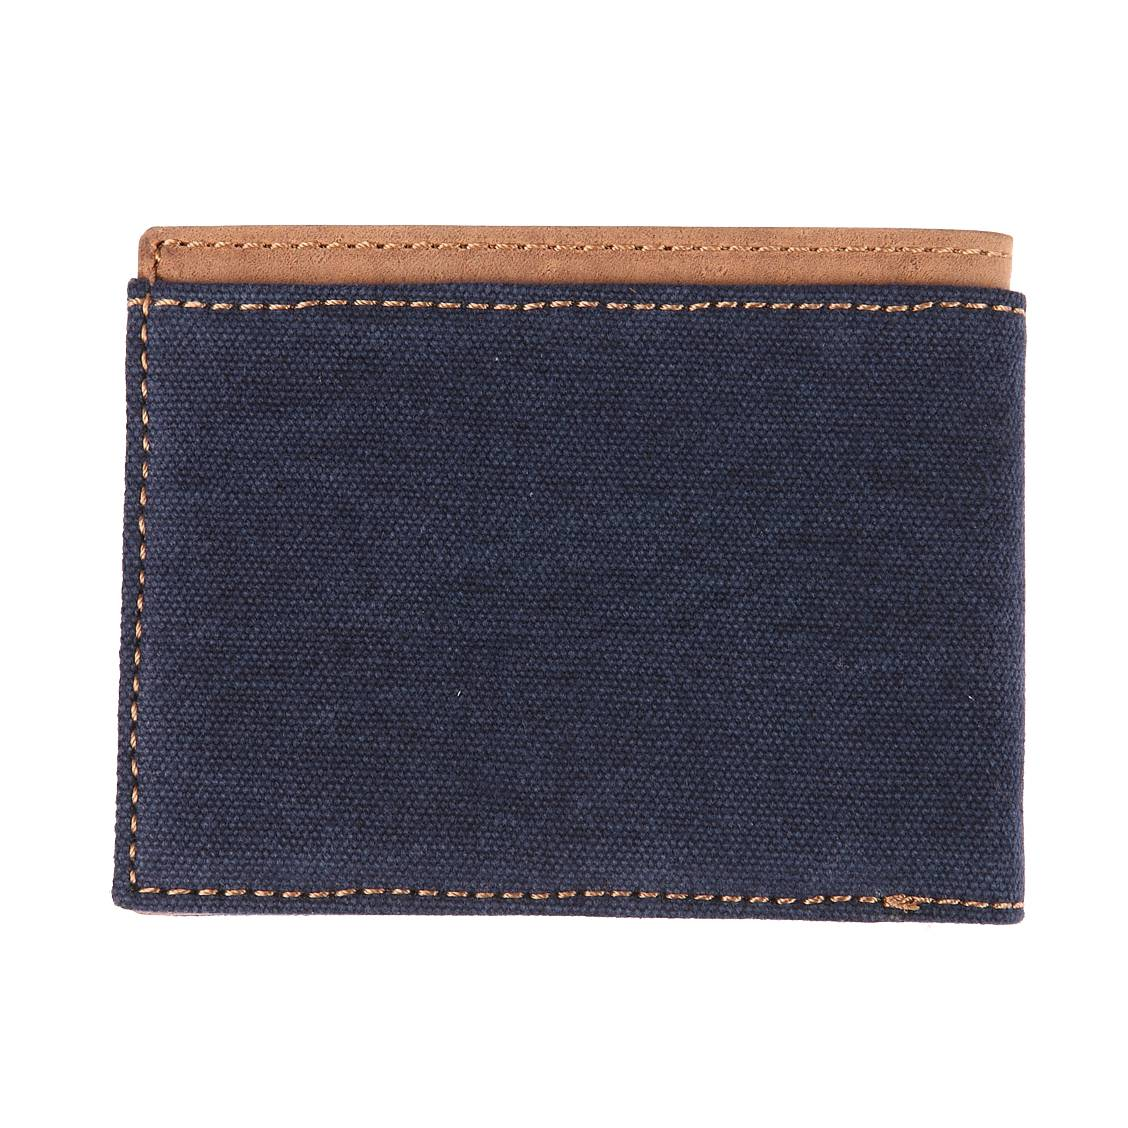 portefeuille italien 2 volets pepe jeans en toile bleu jean et cuir marron rue des hommes. Black Bedroom Furniture Sets. Home Design Ideas